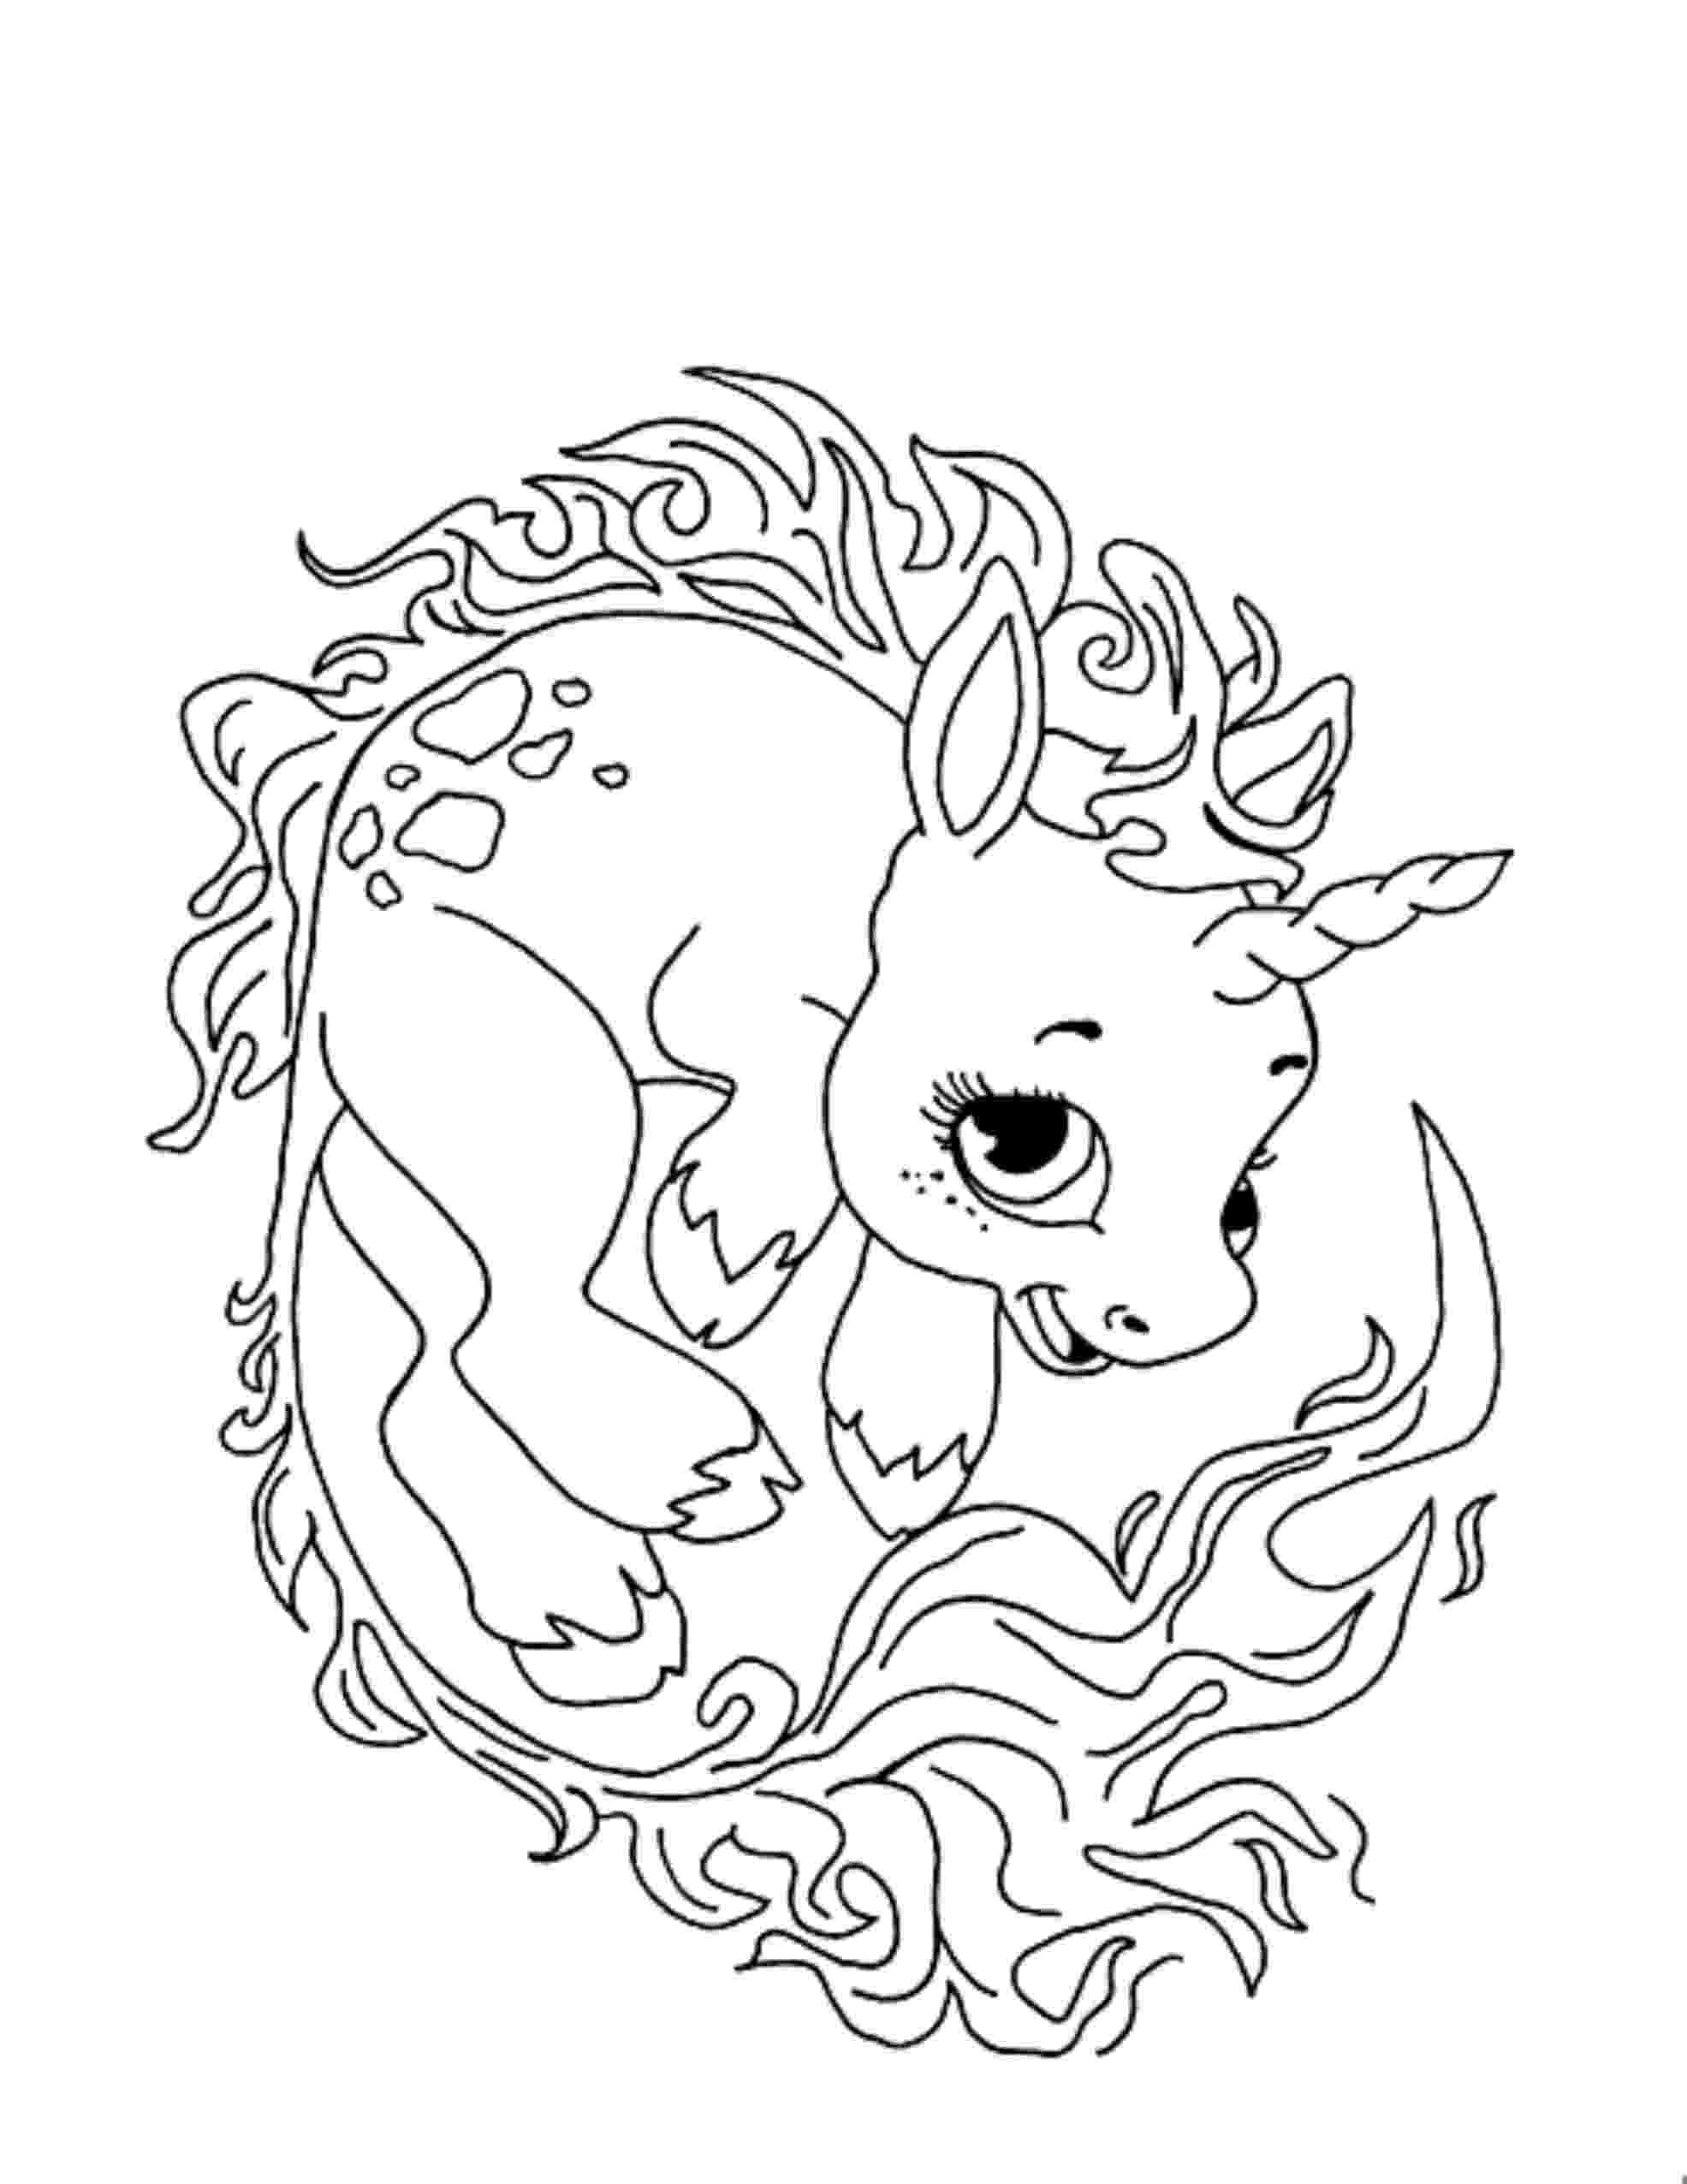 unicorn picture to color cute unicorn coloring page free printable coloring pages picture unicorn to color